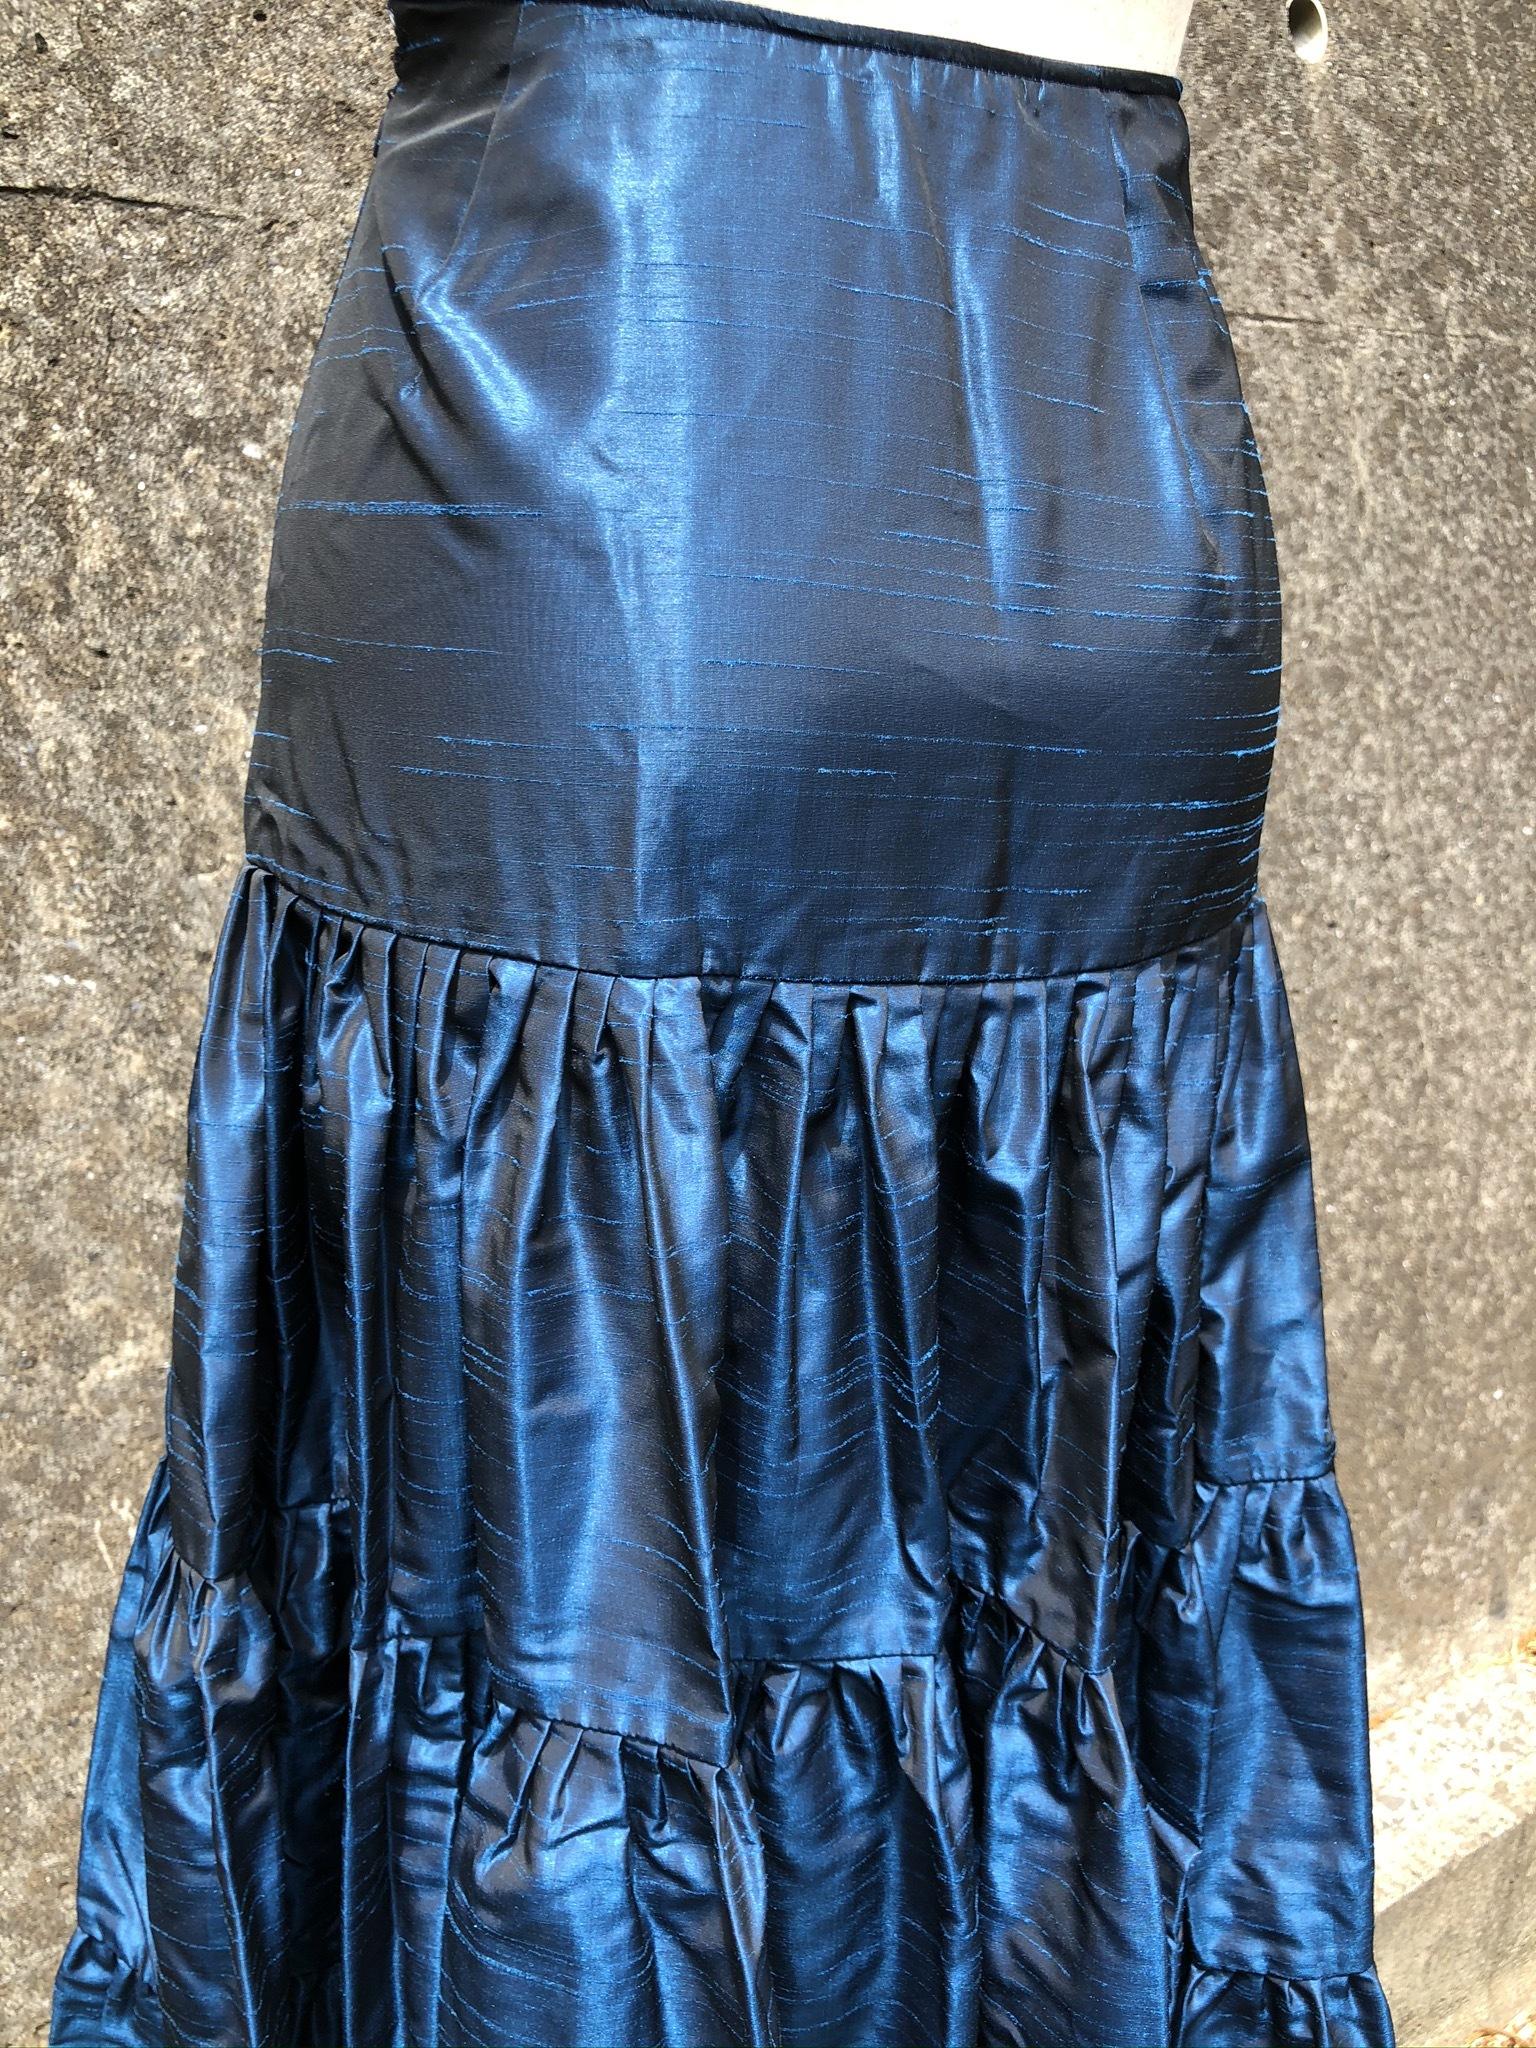 taffeta tiered skirt